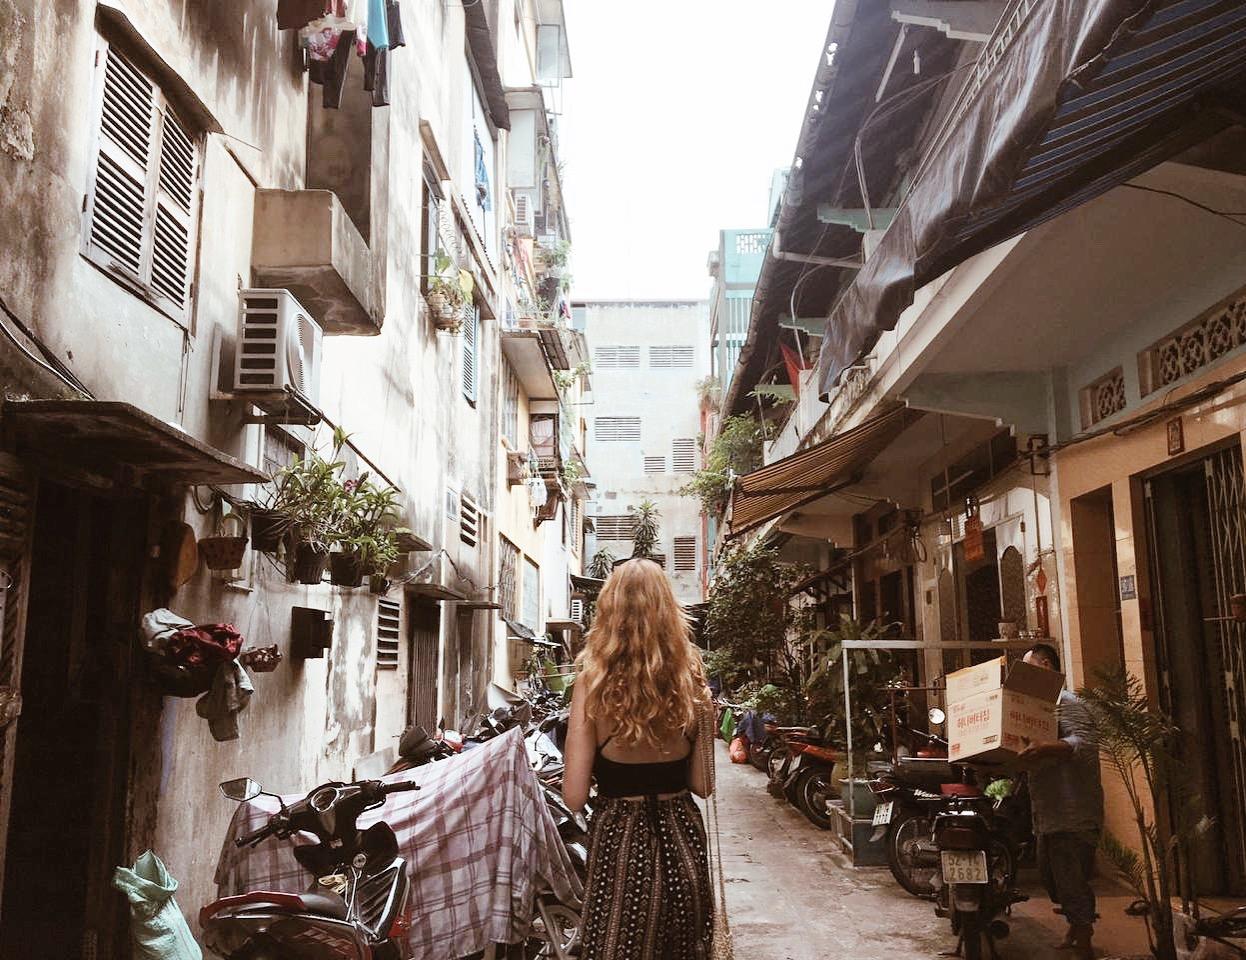 Arriving in Ho Chi Minh City, Vietnam